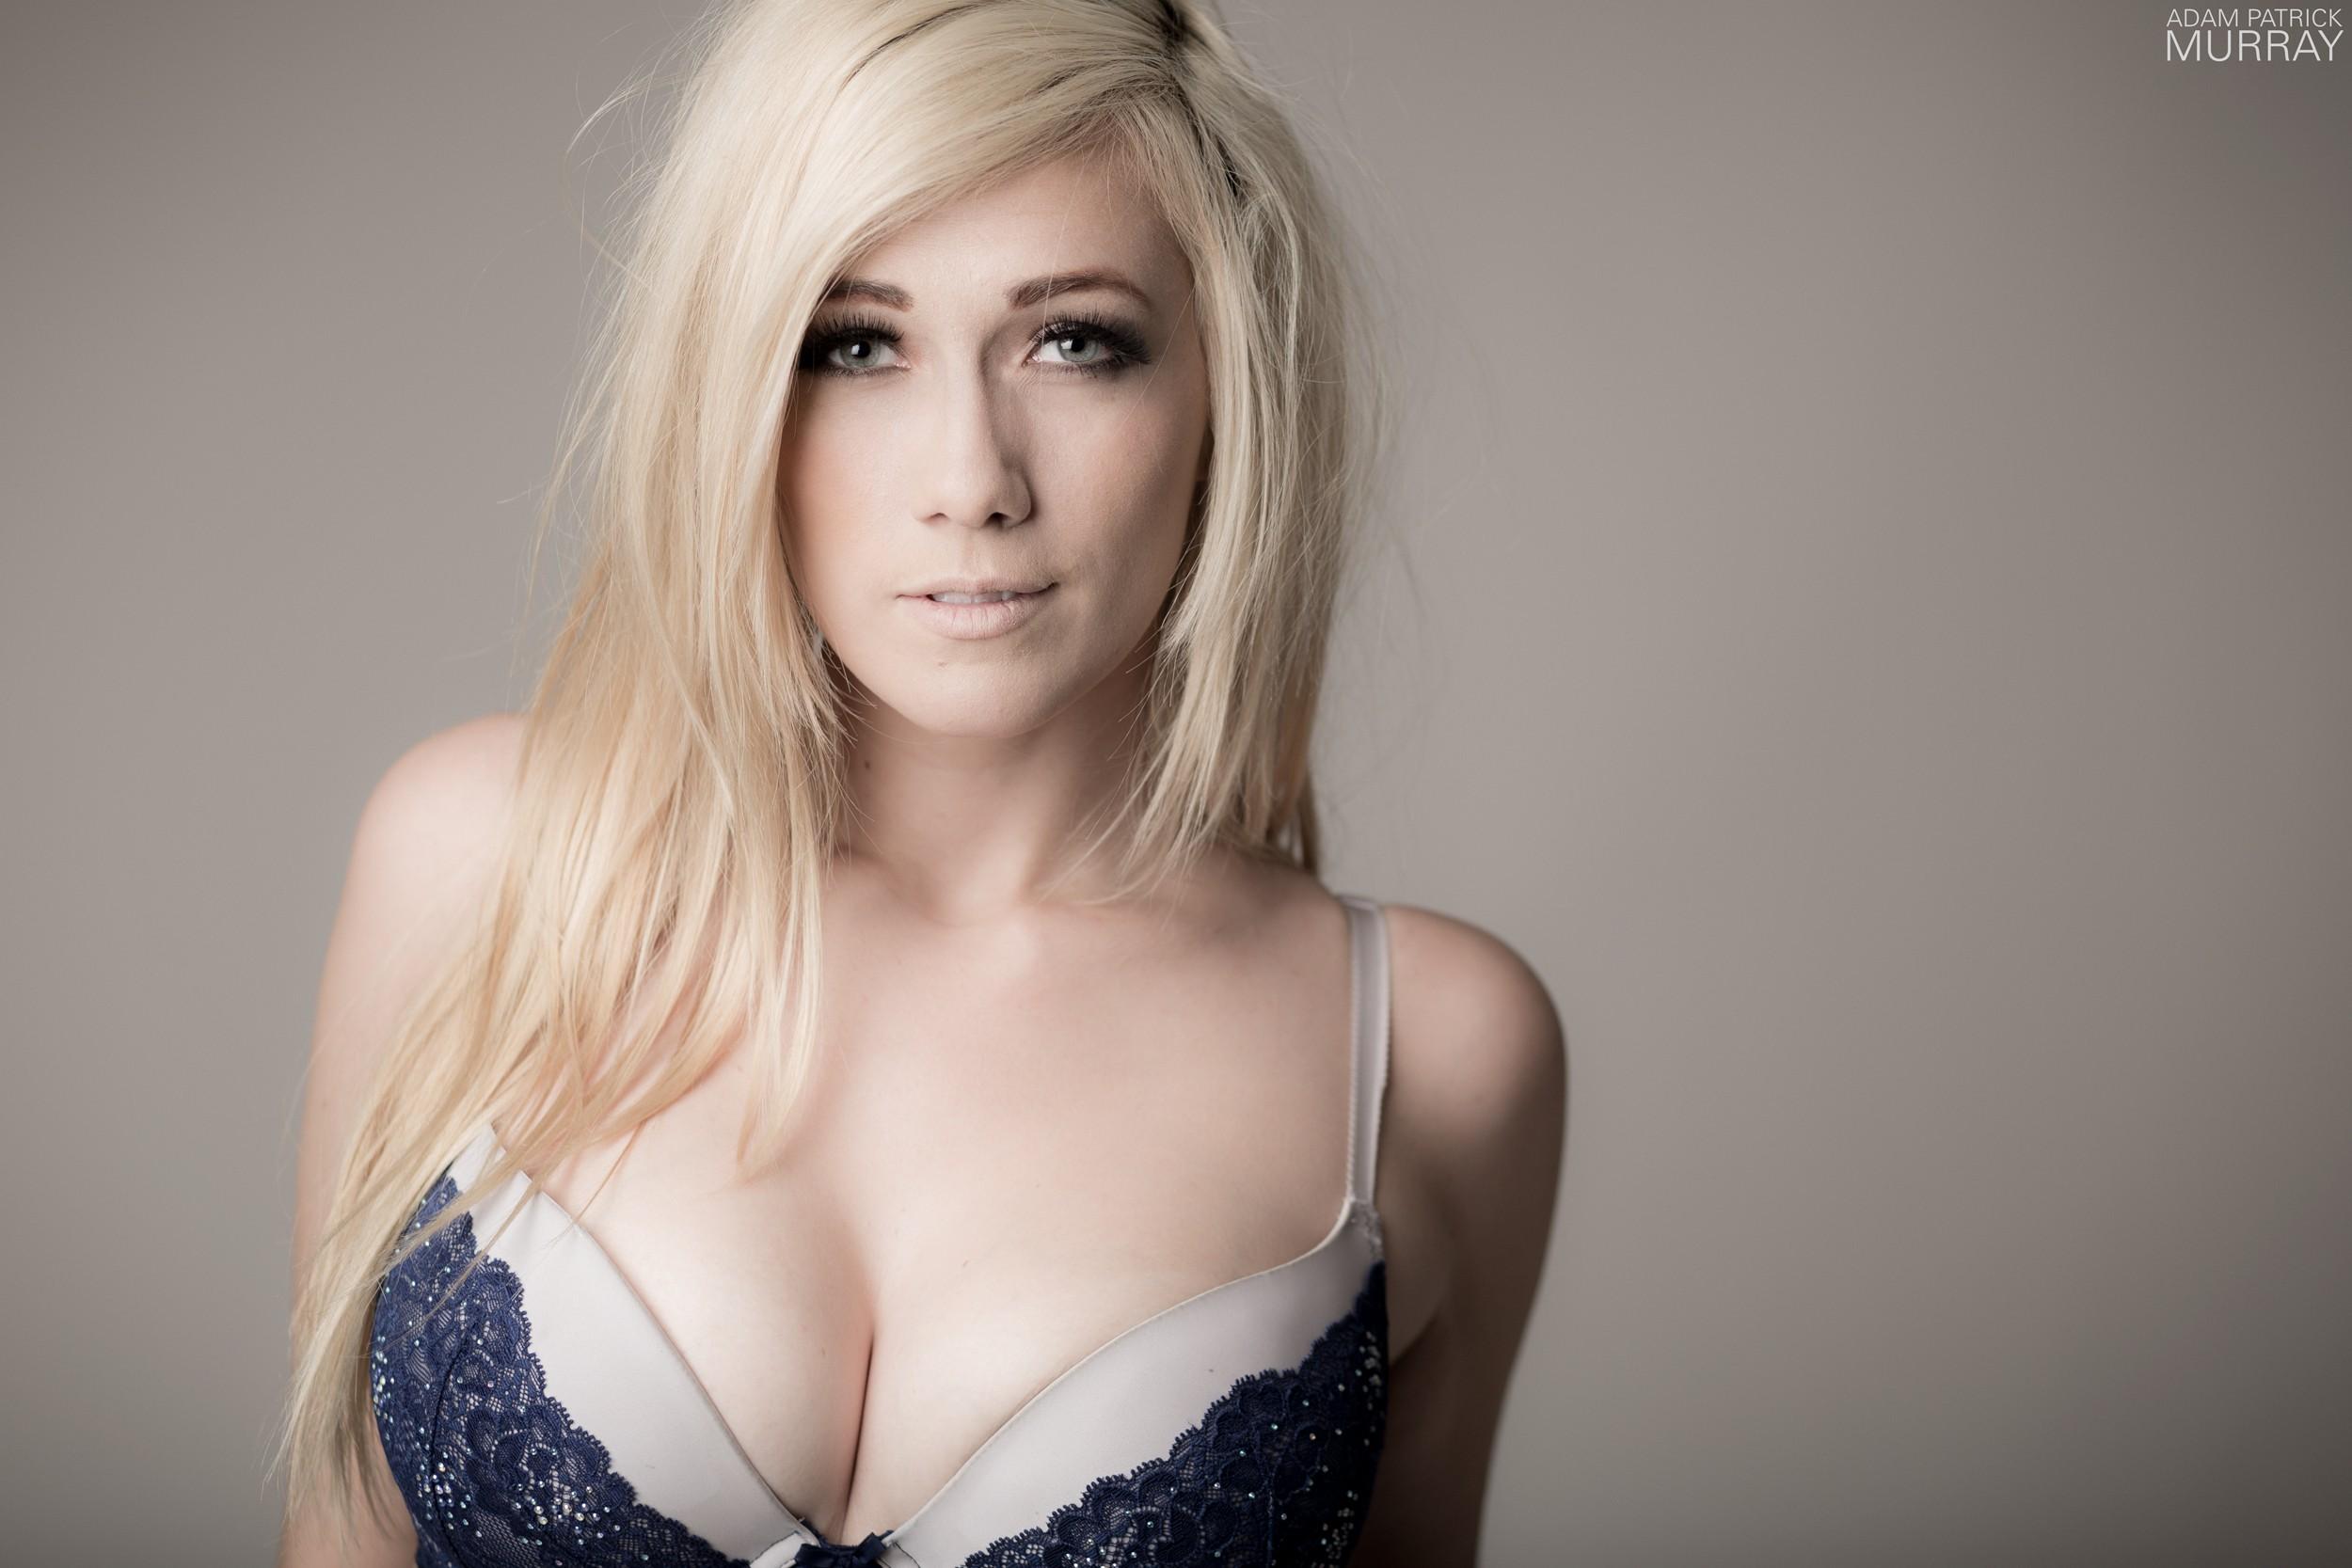 Amy hathaway spank